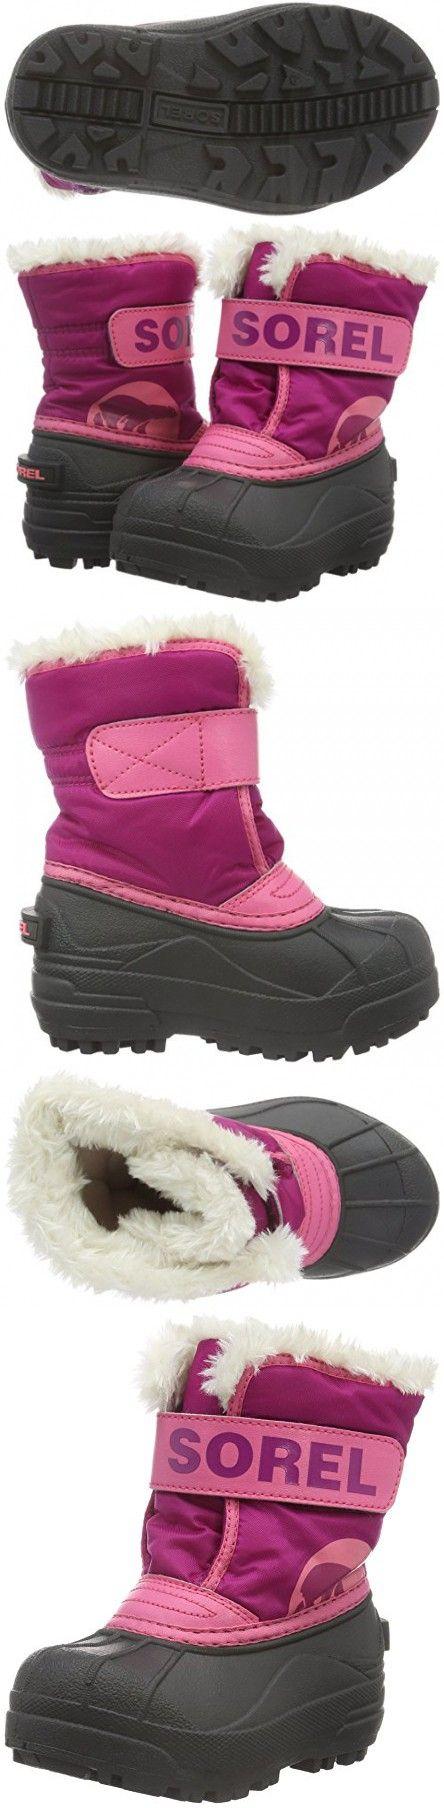 Sorel Kids' Childrens Commander-K Snow Boot, Tropic Pink, 9 M US Toddler